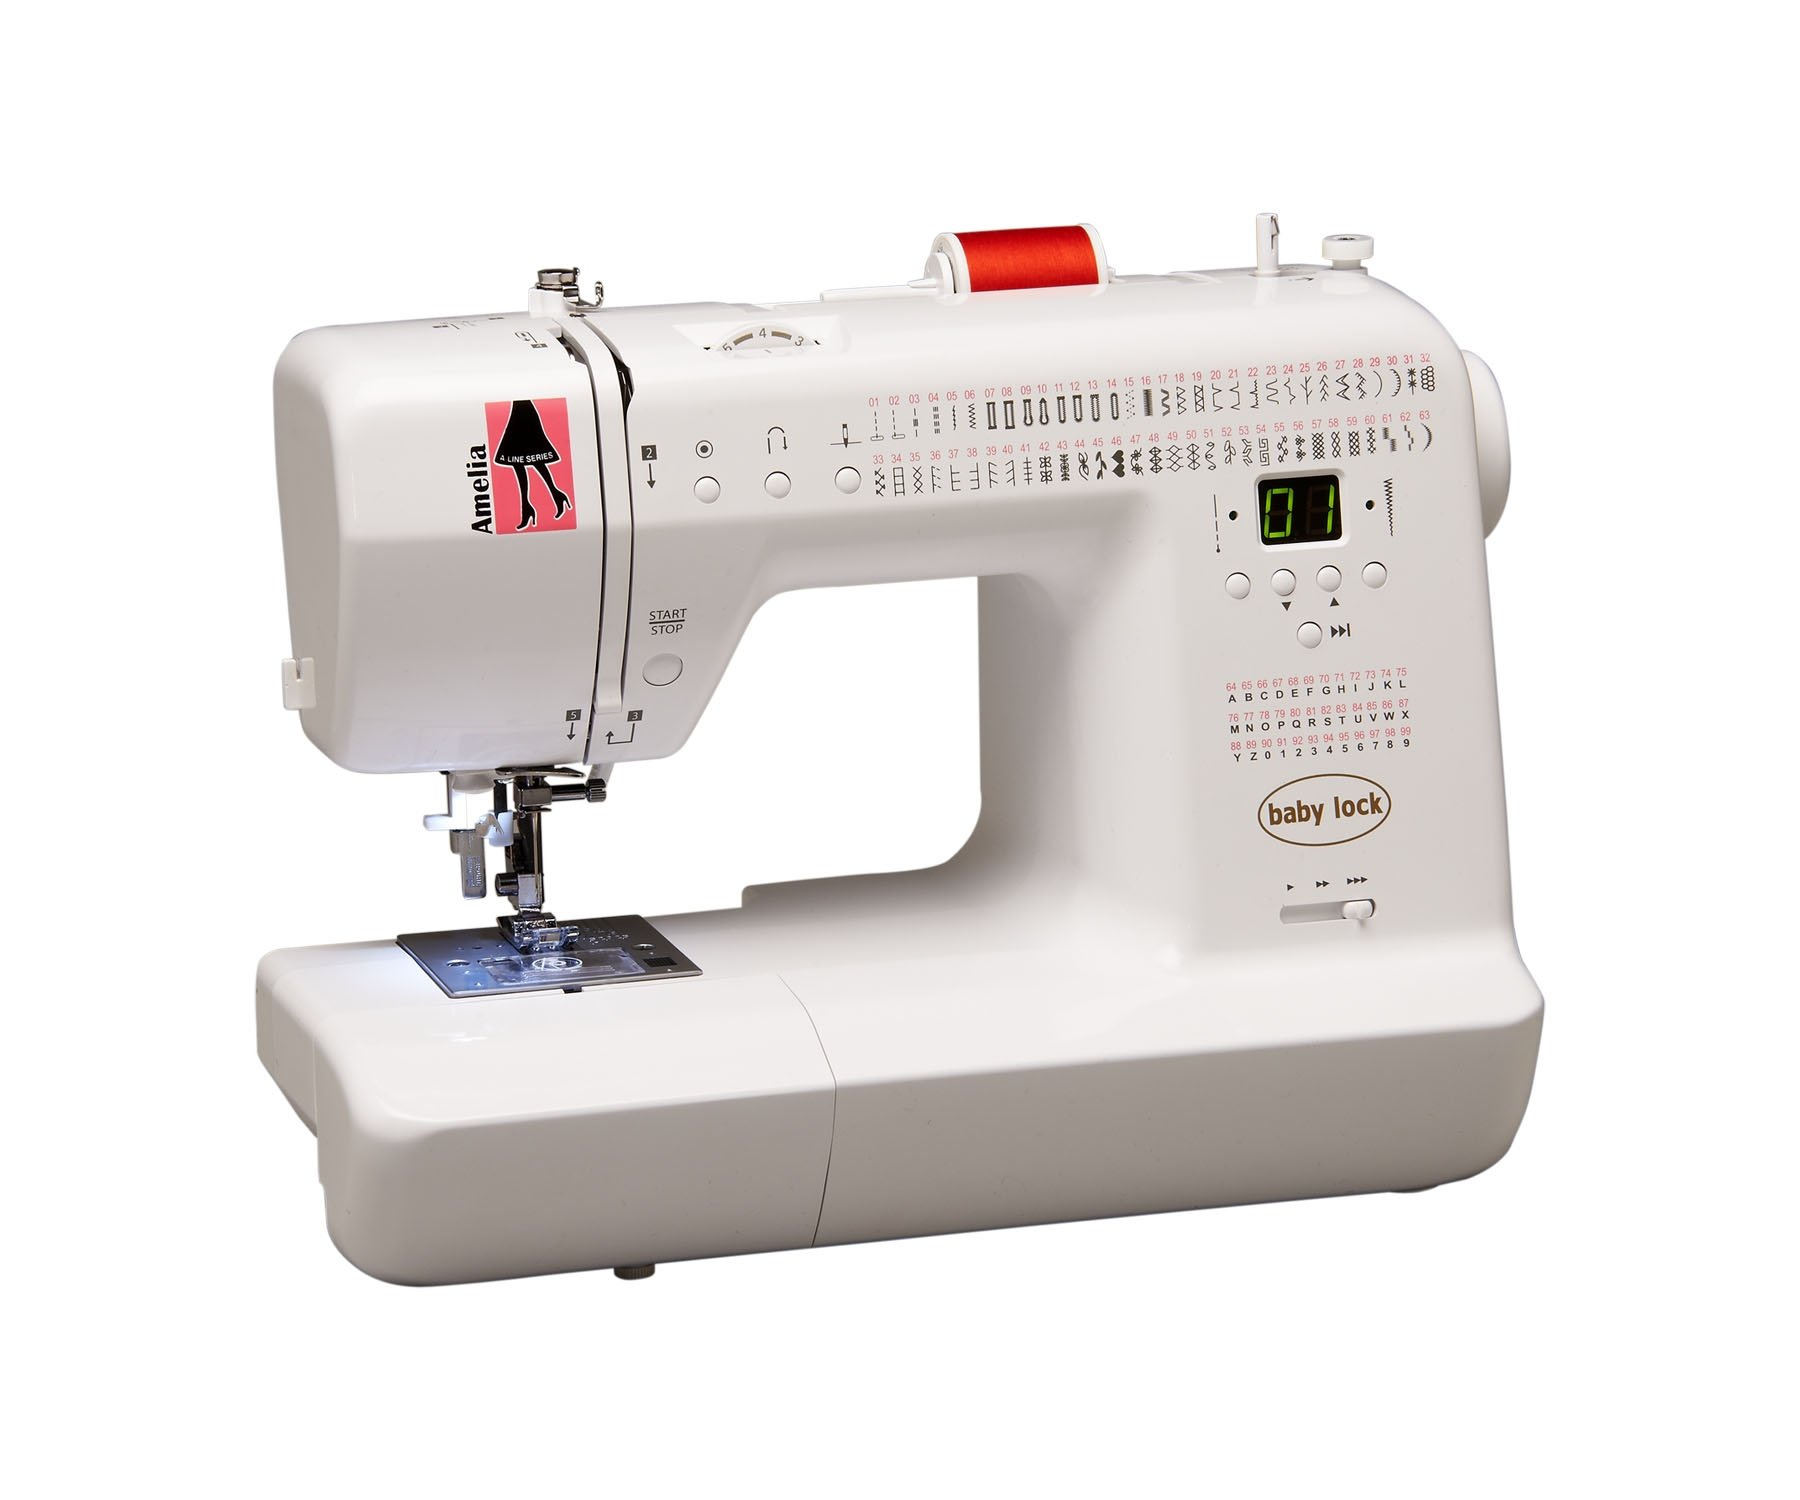 BABY LOCK AMELIA Electronic Sewing machine